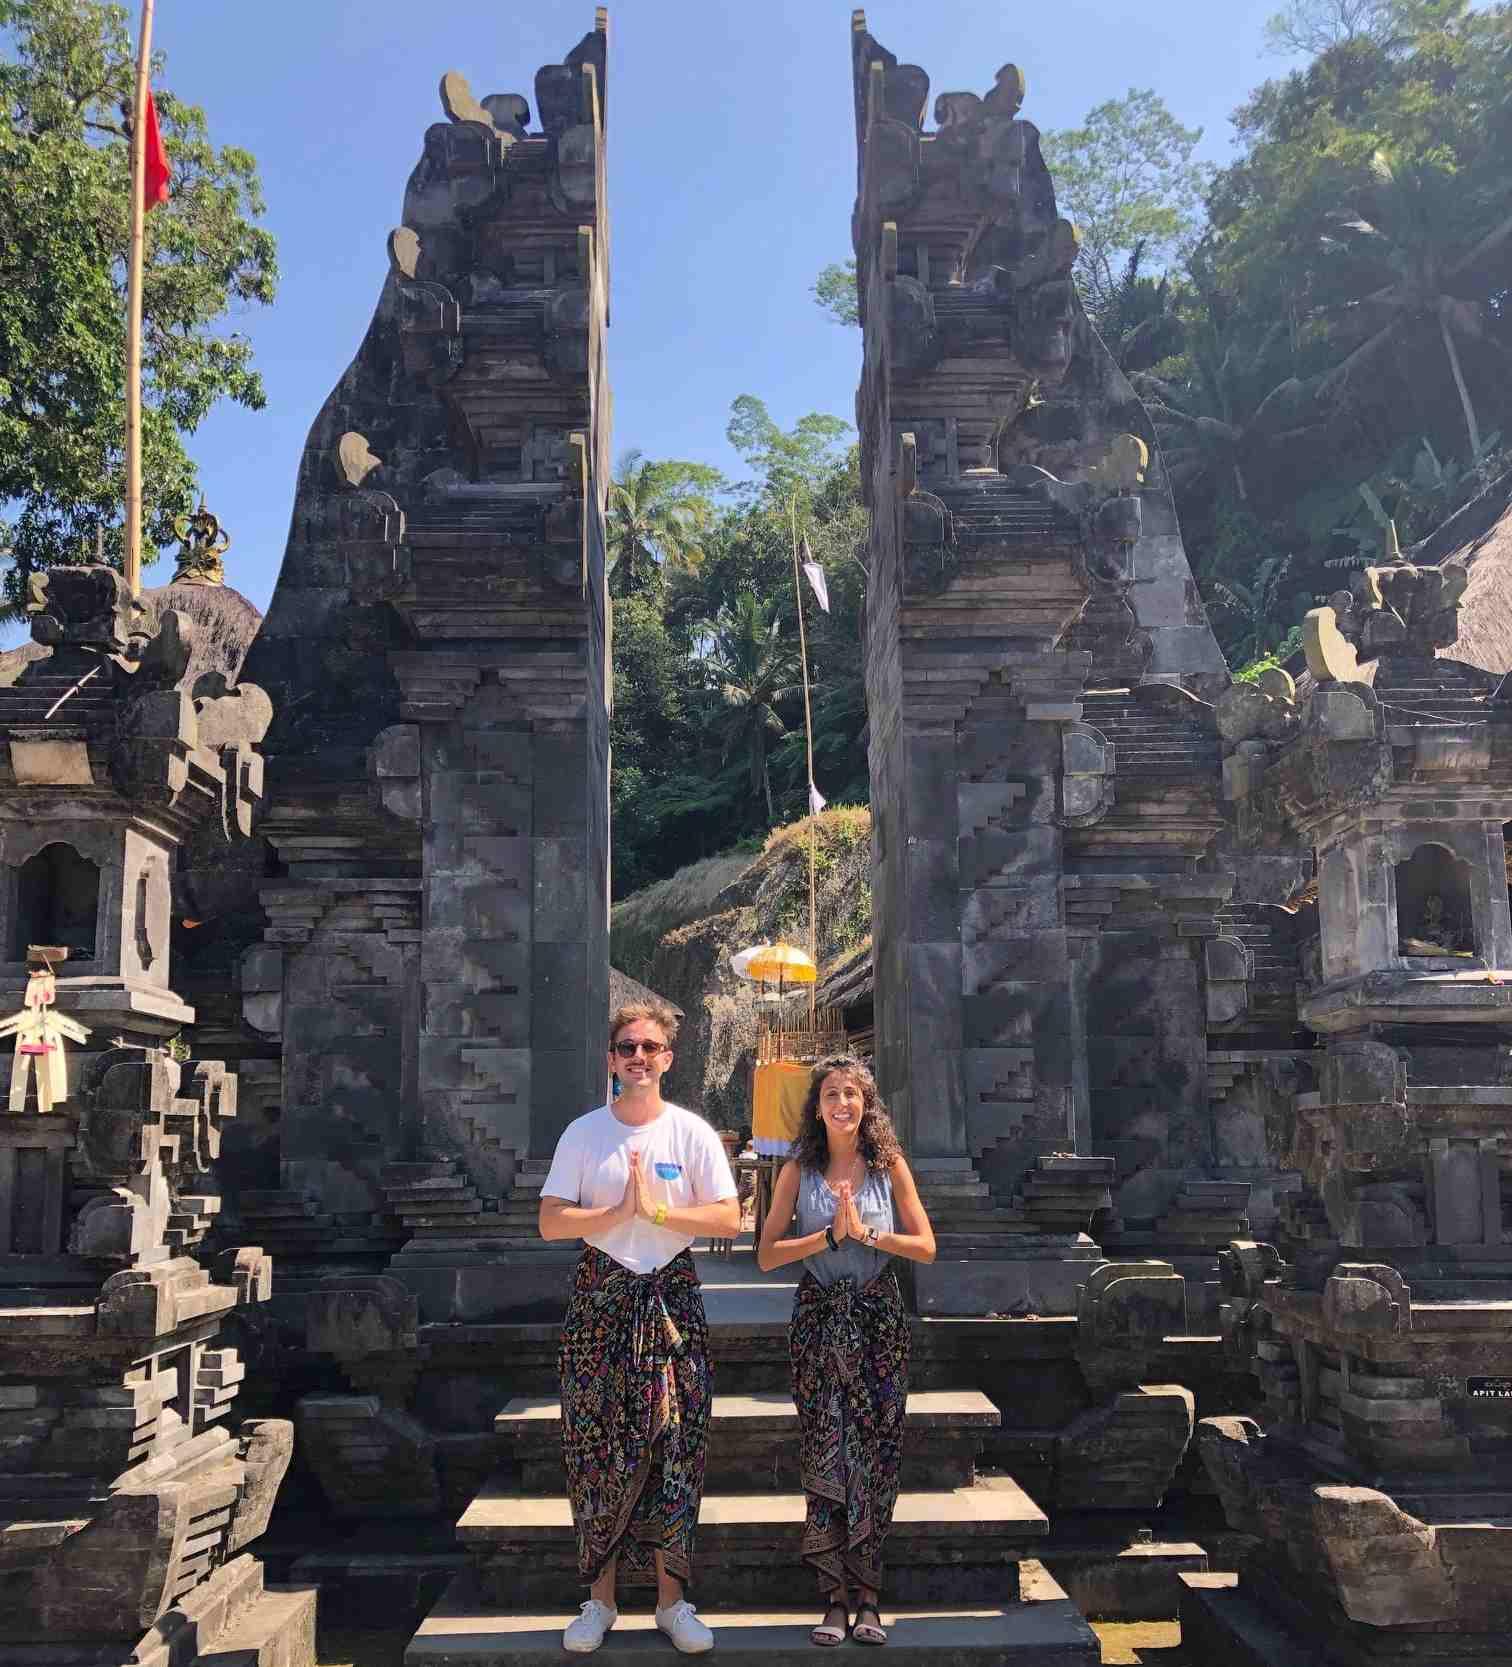 Ruta por Bali - Gunung Kawi